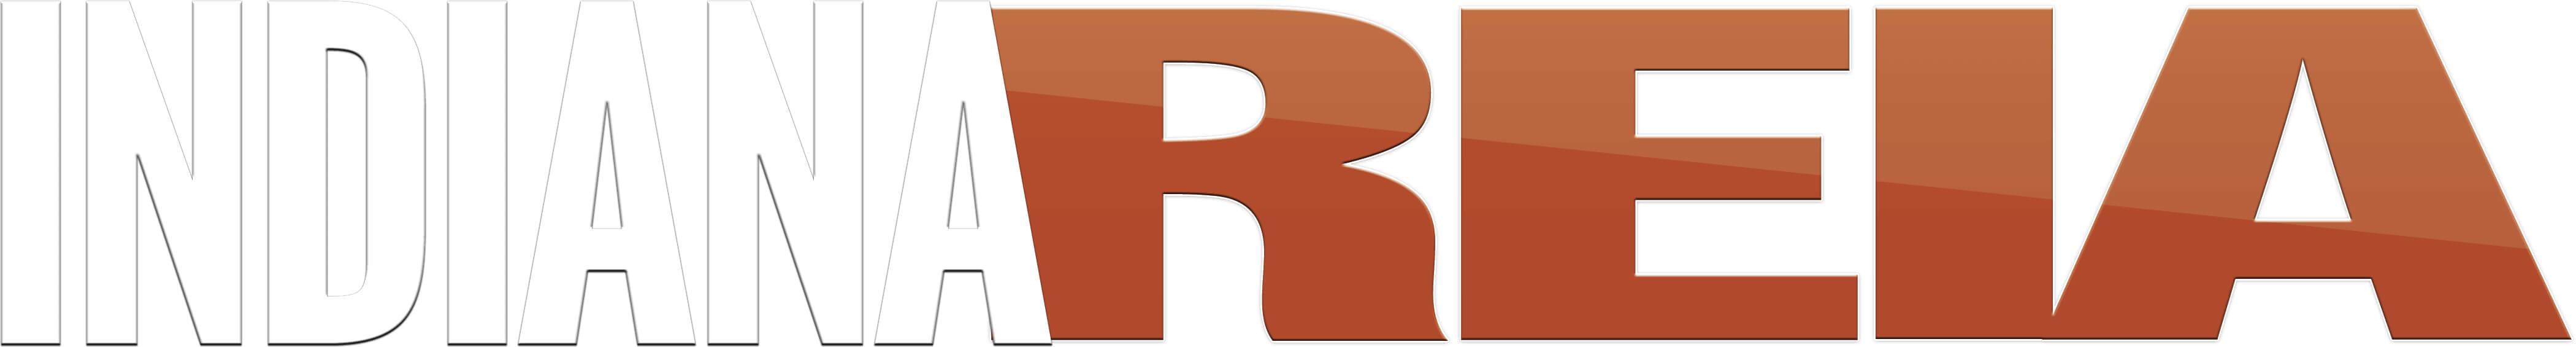 marketing-and-media-for-fort-wayne-indiana-real-estate-investors-association-25